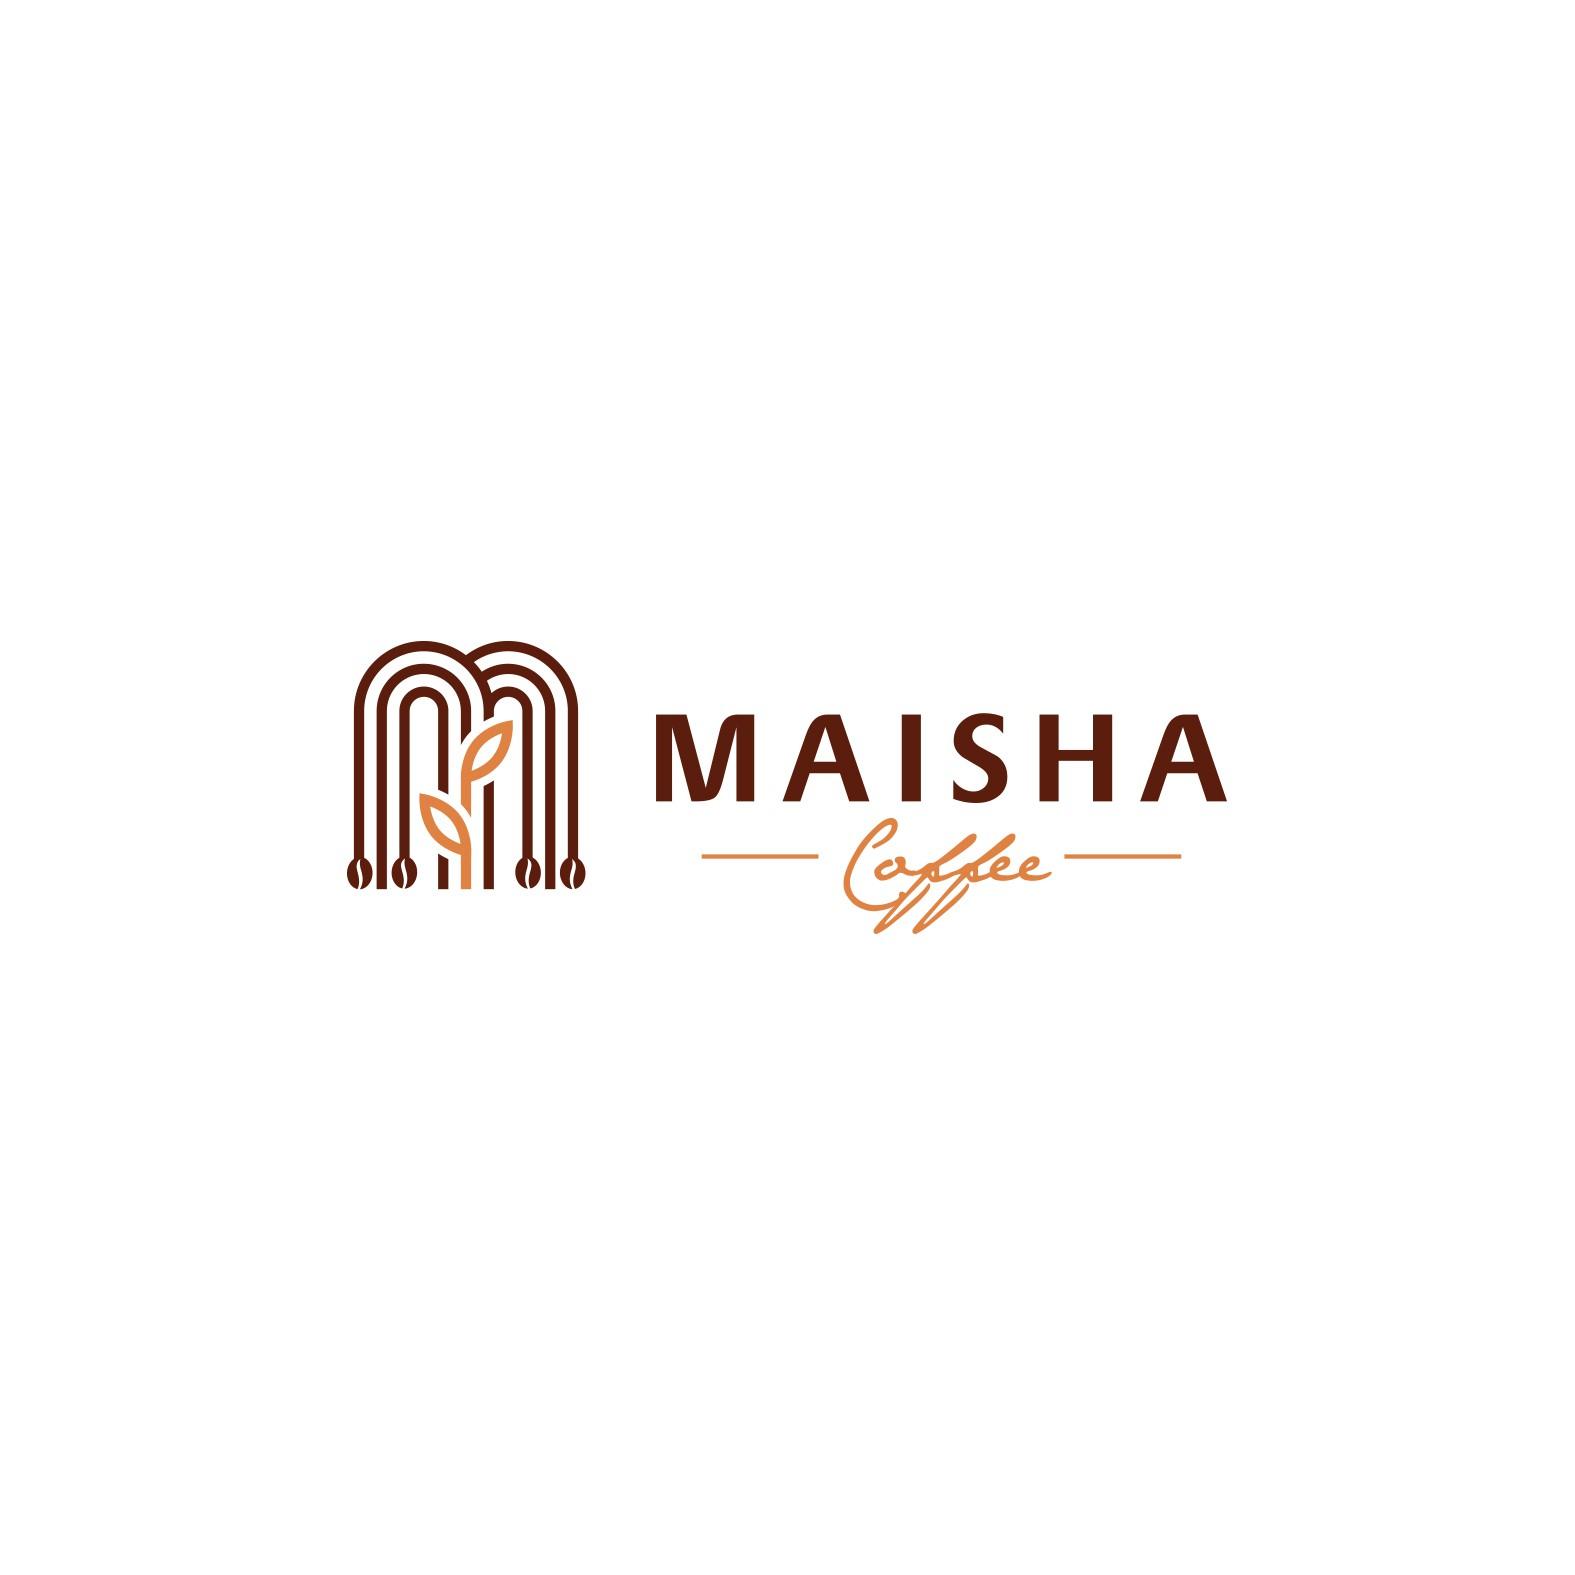 Coffee company needs a modern, attention-grabbing logo